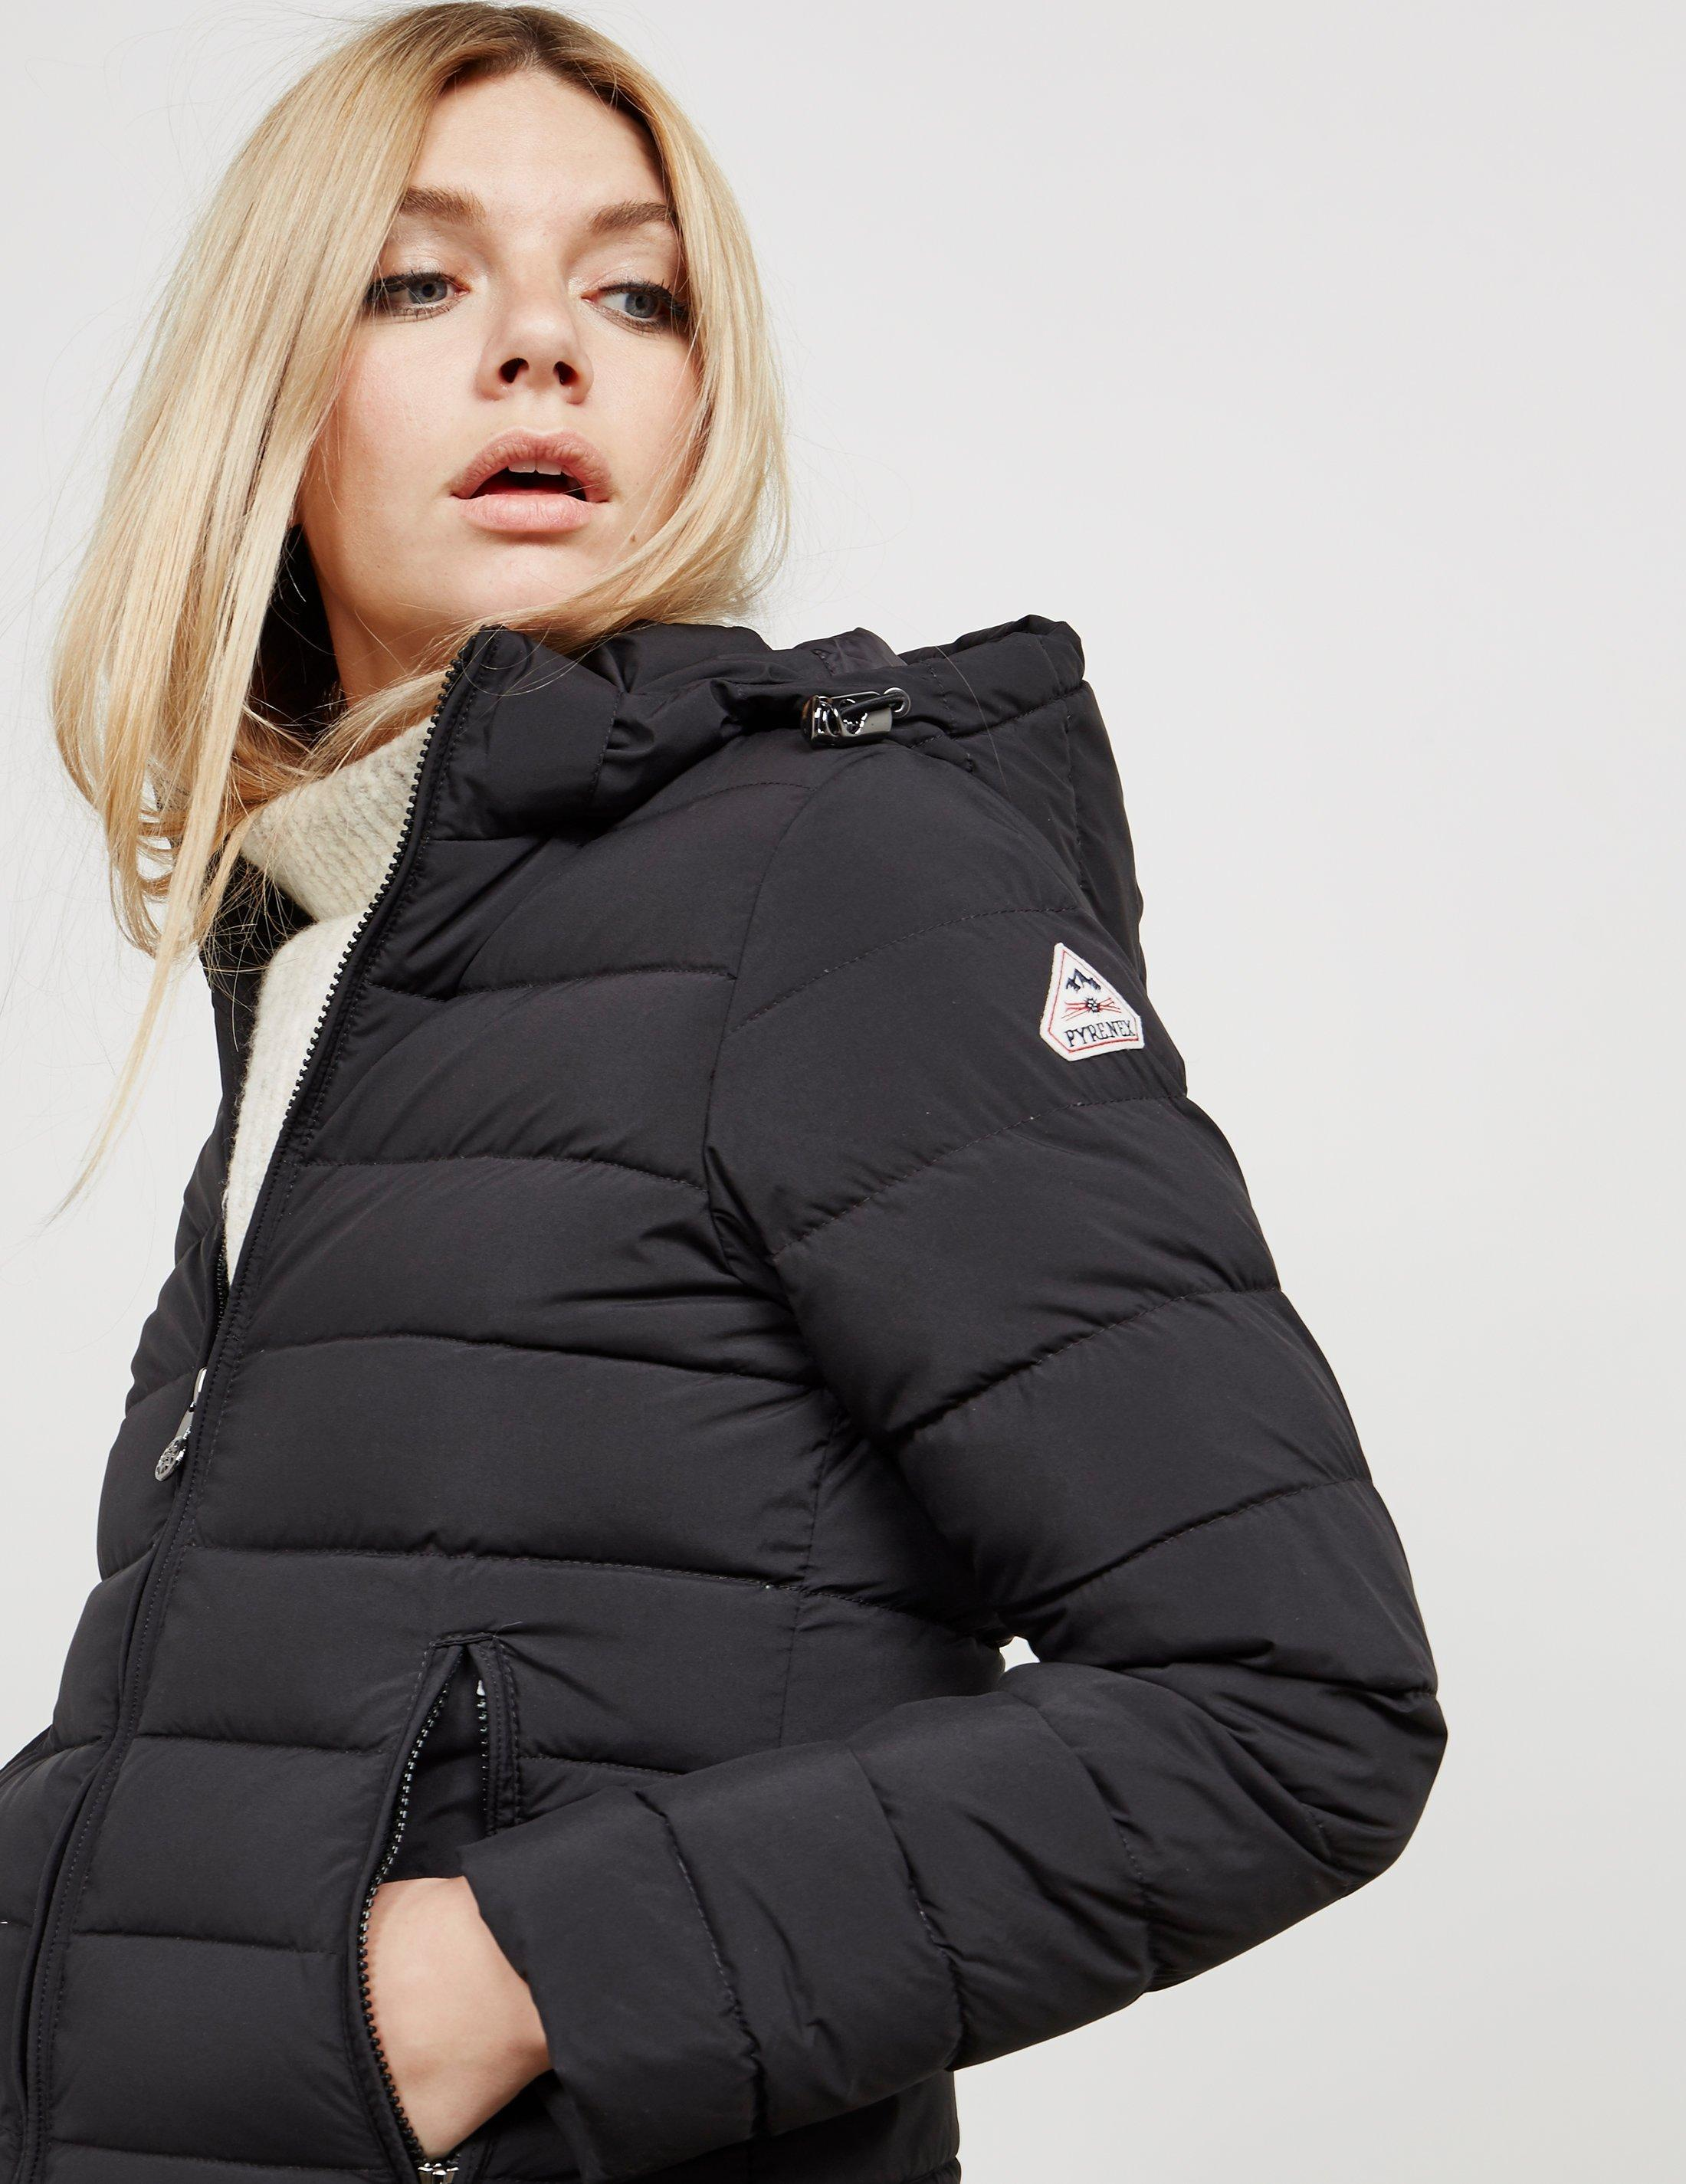 603789c1a5d Pyrenex Spoutnic Soft Padded Jacket Black in Black - Lyst